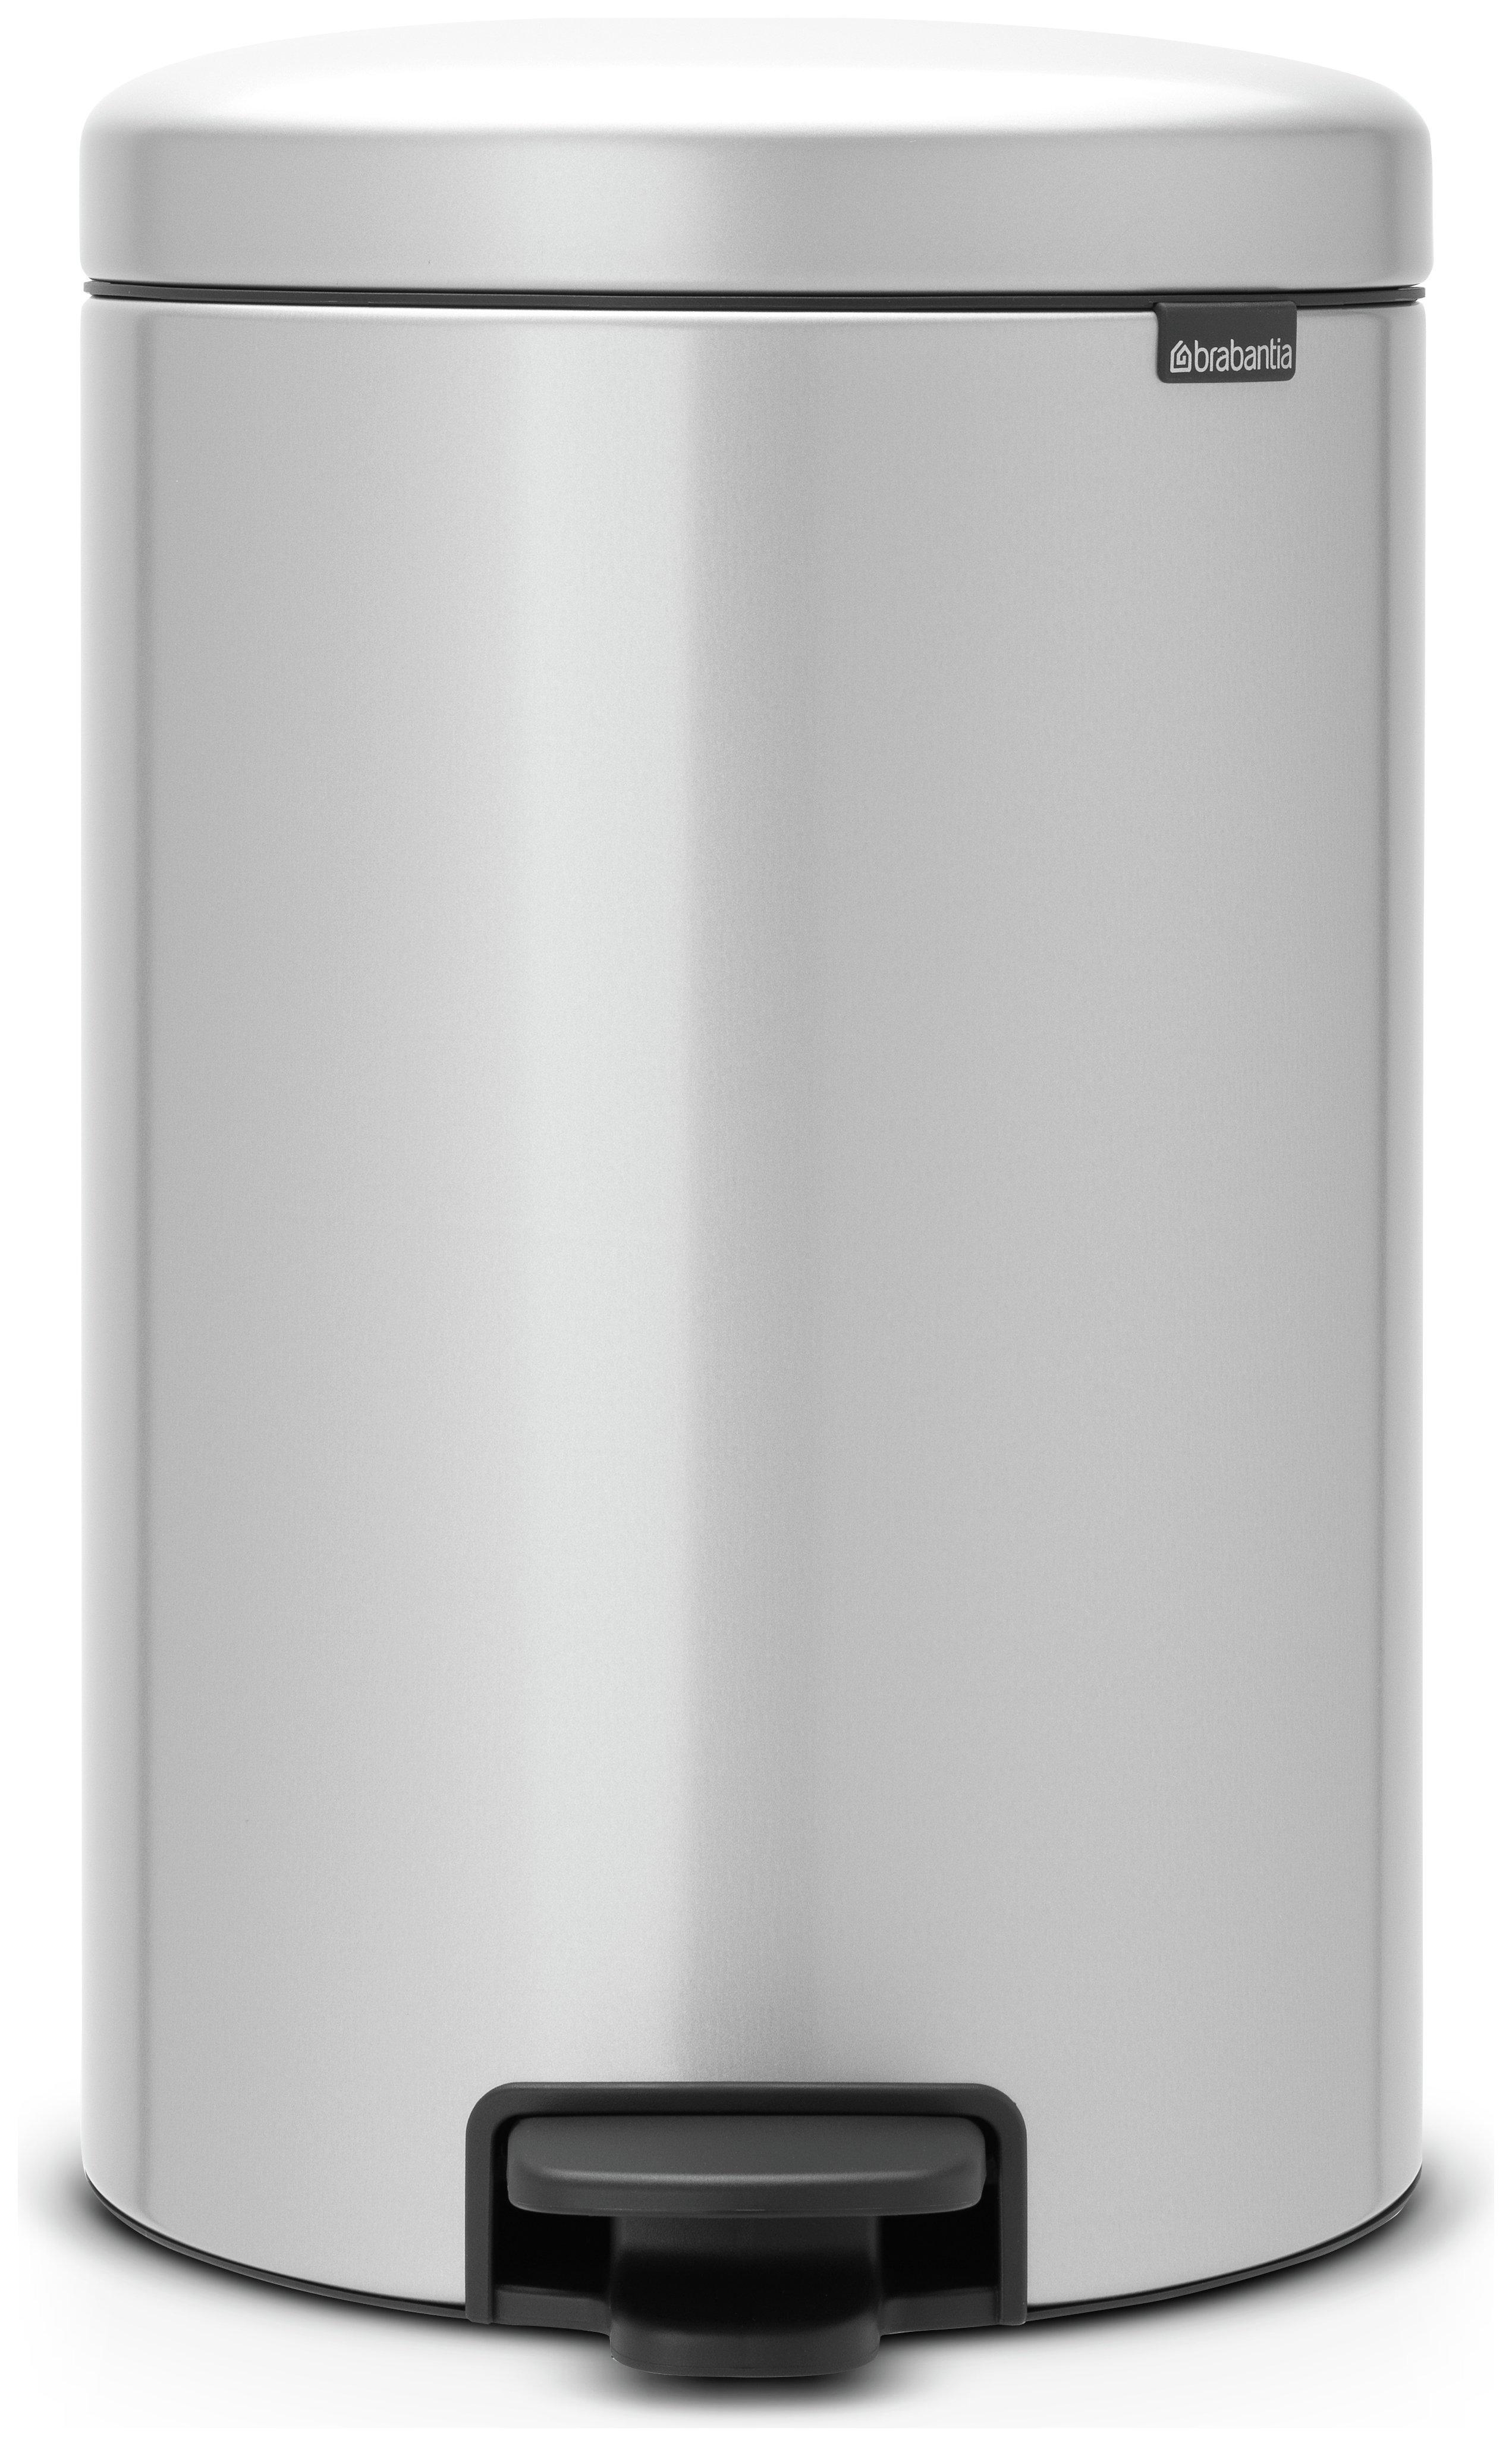 Brabantia newIcon 20 Litre Pedal Bin - Metallic Grey.